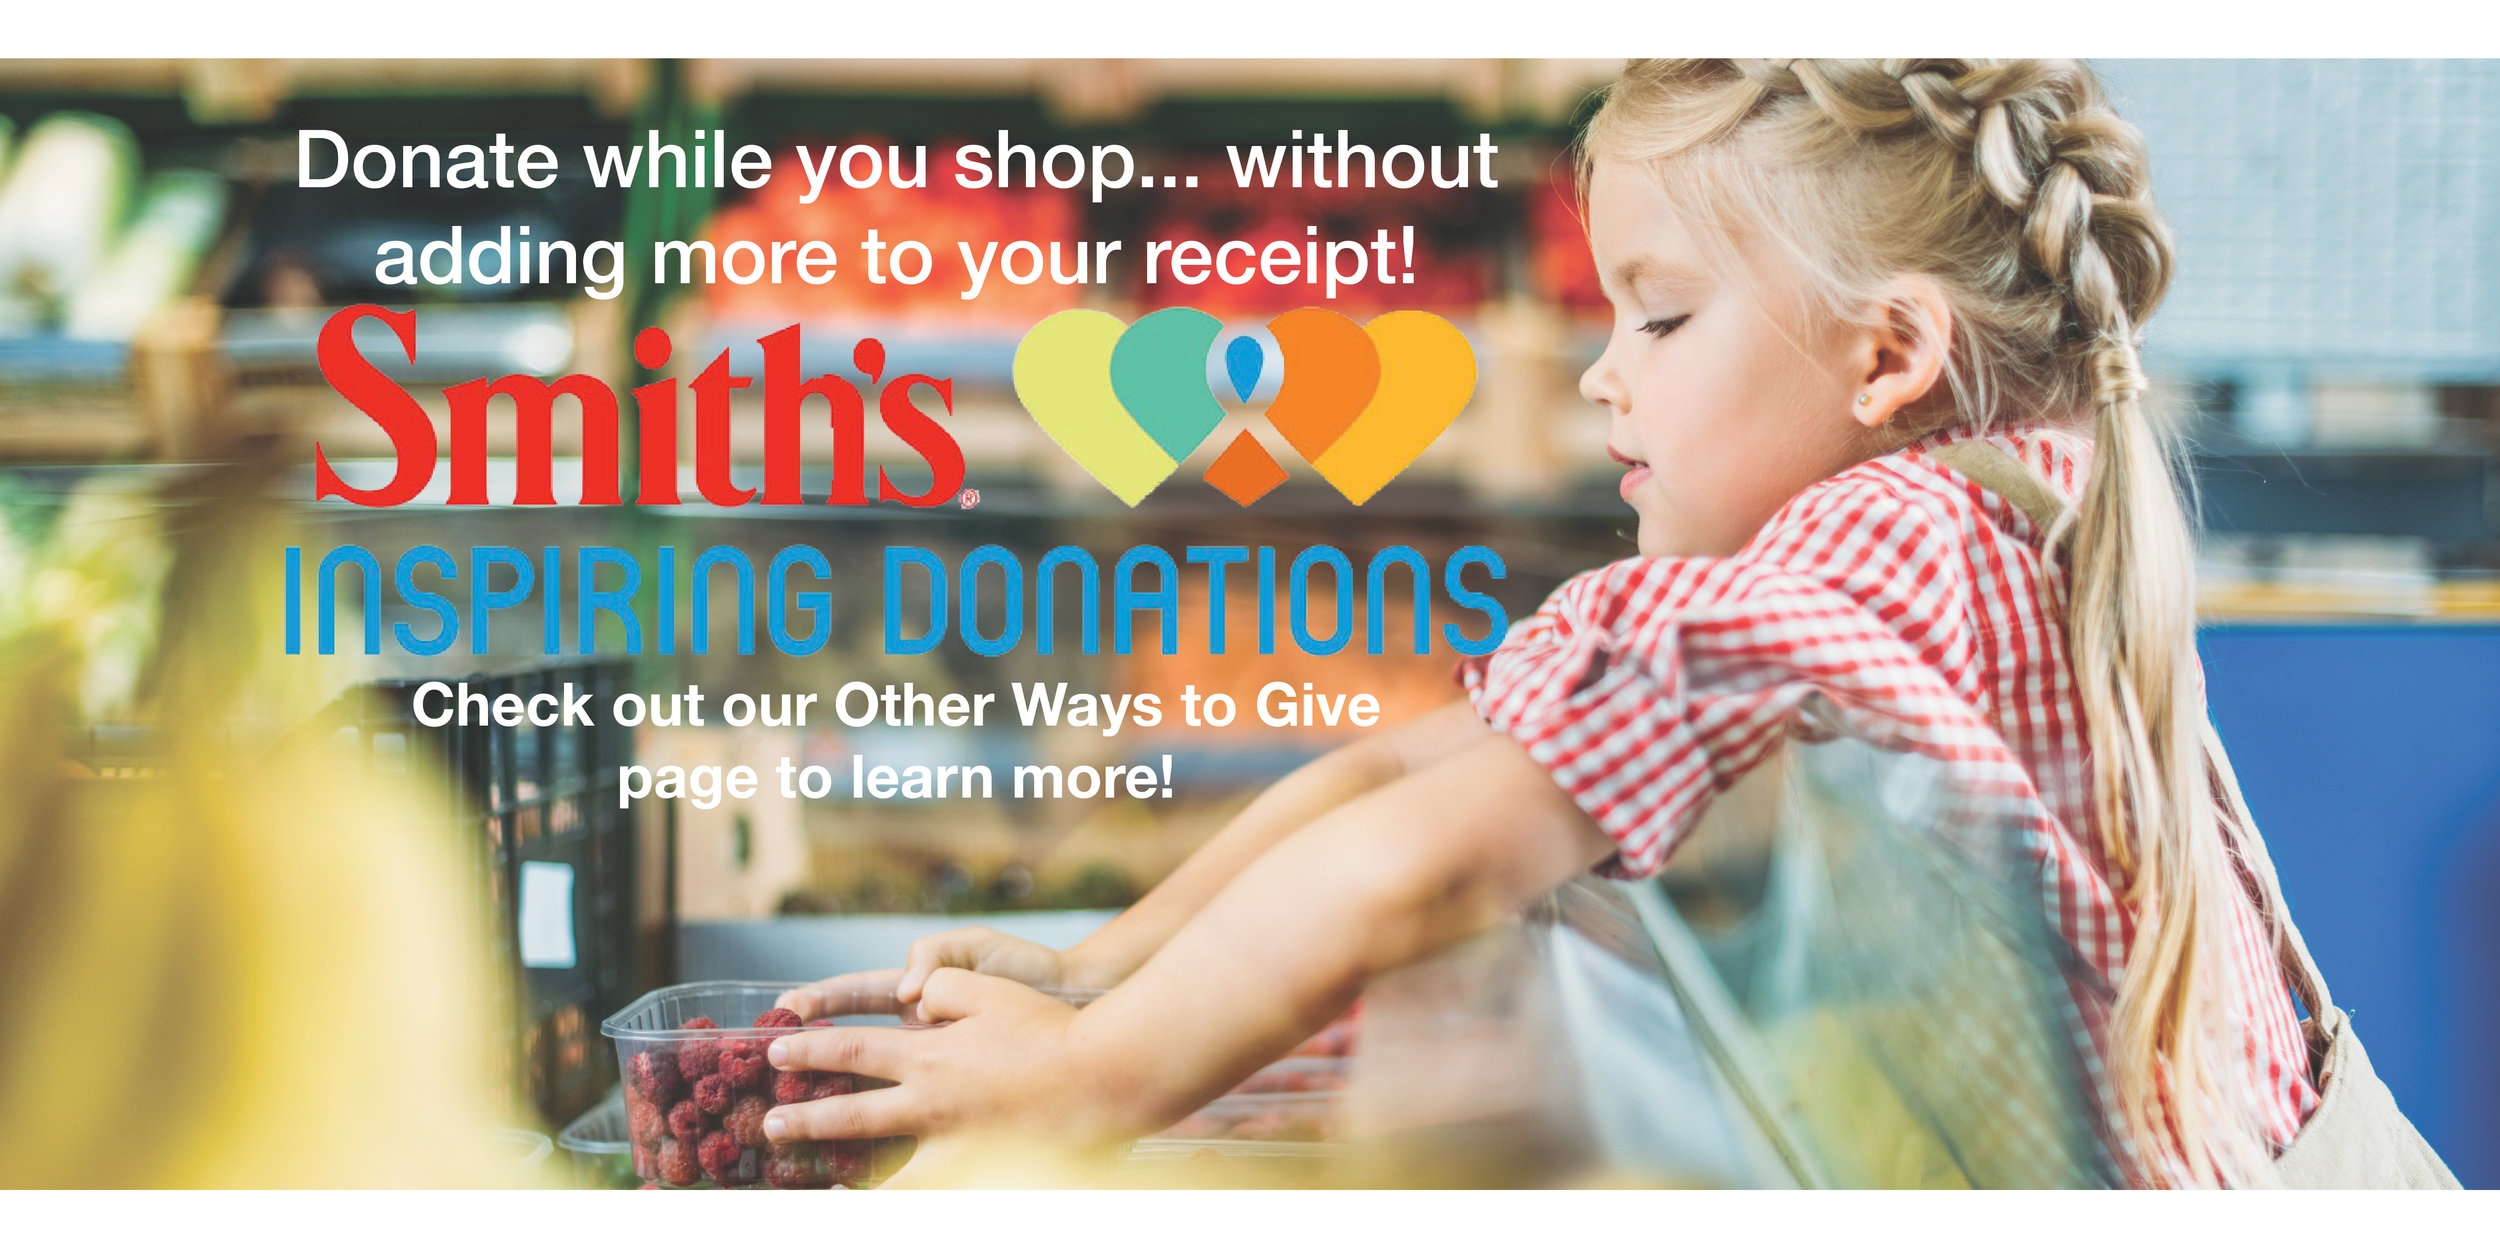 smiths-inspiring-donations-banner.jpg